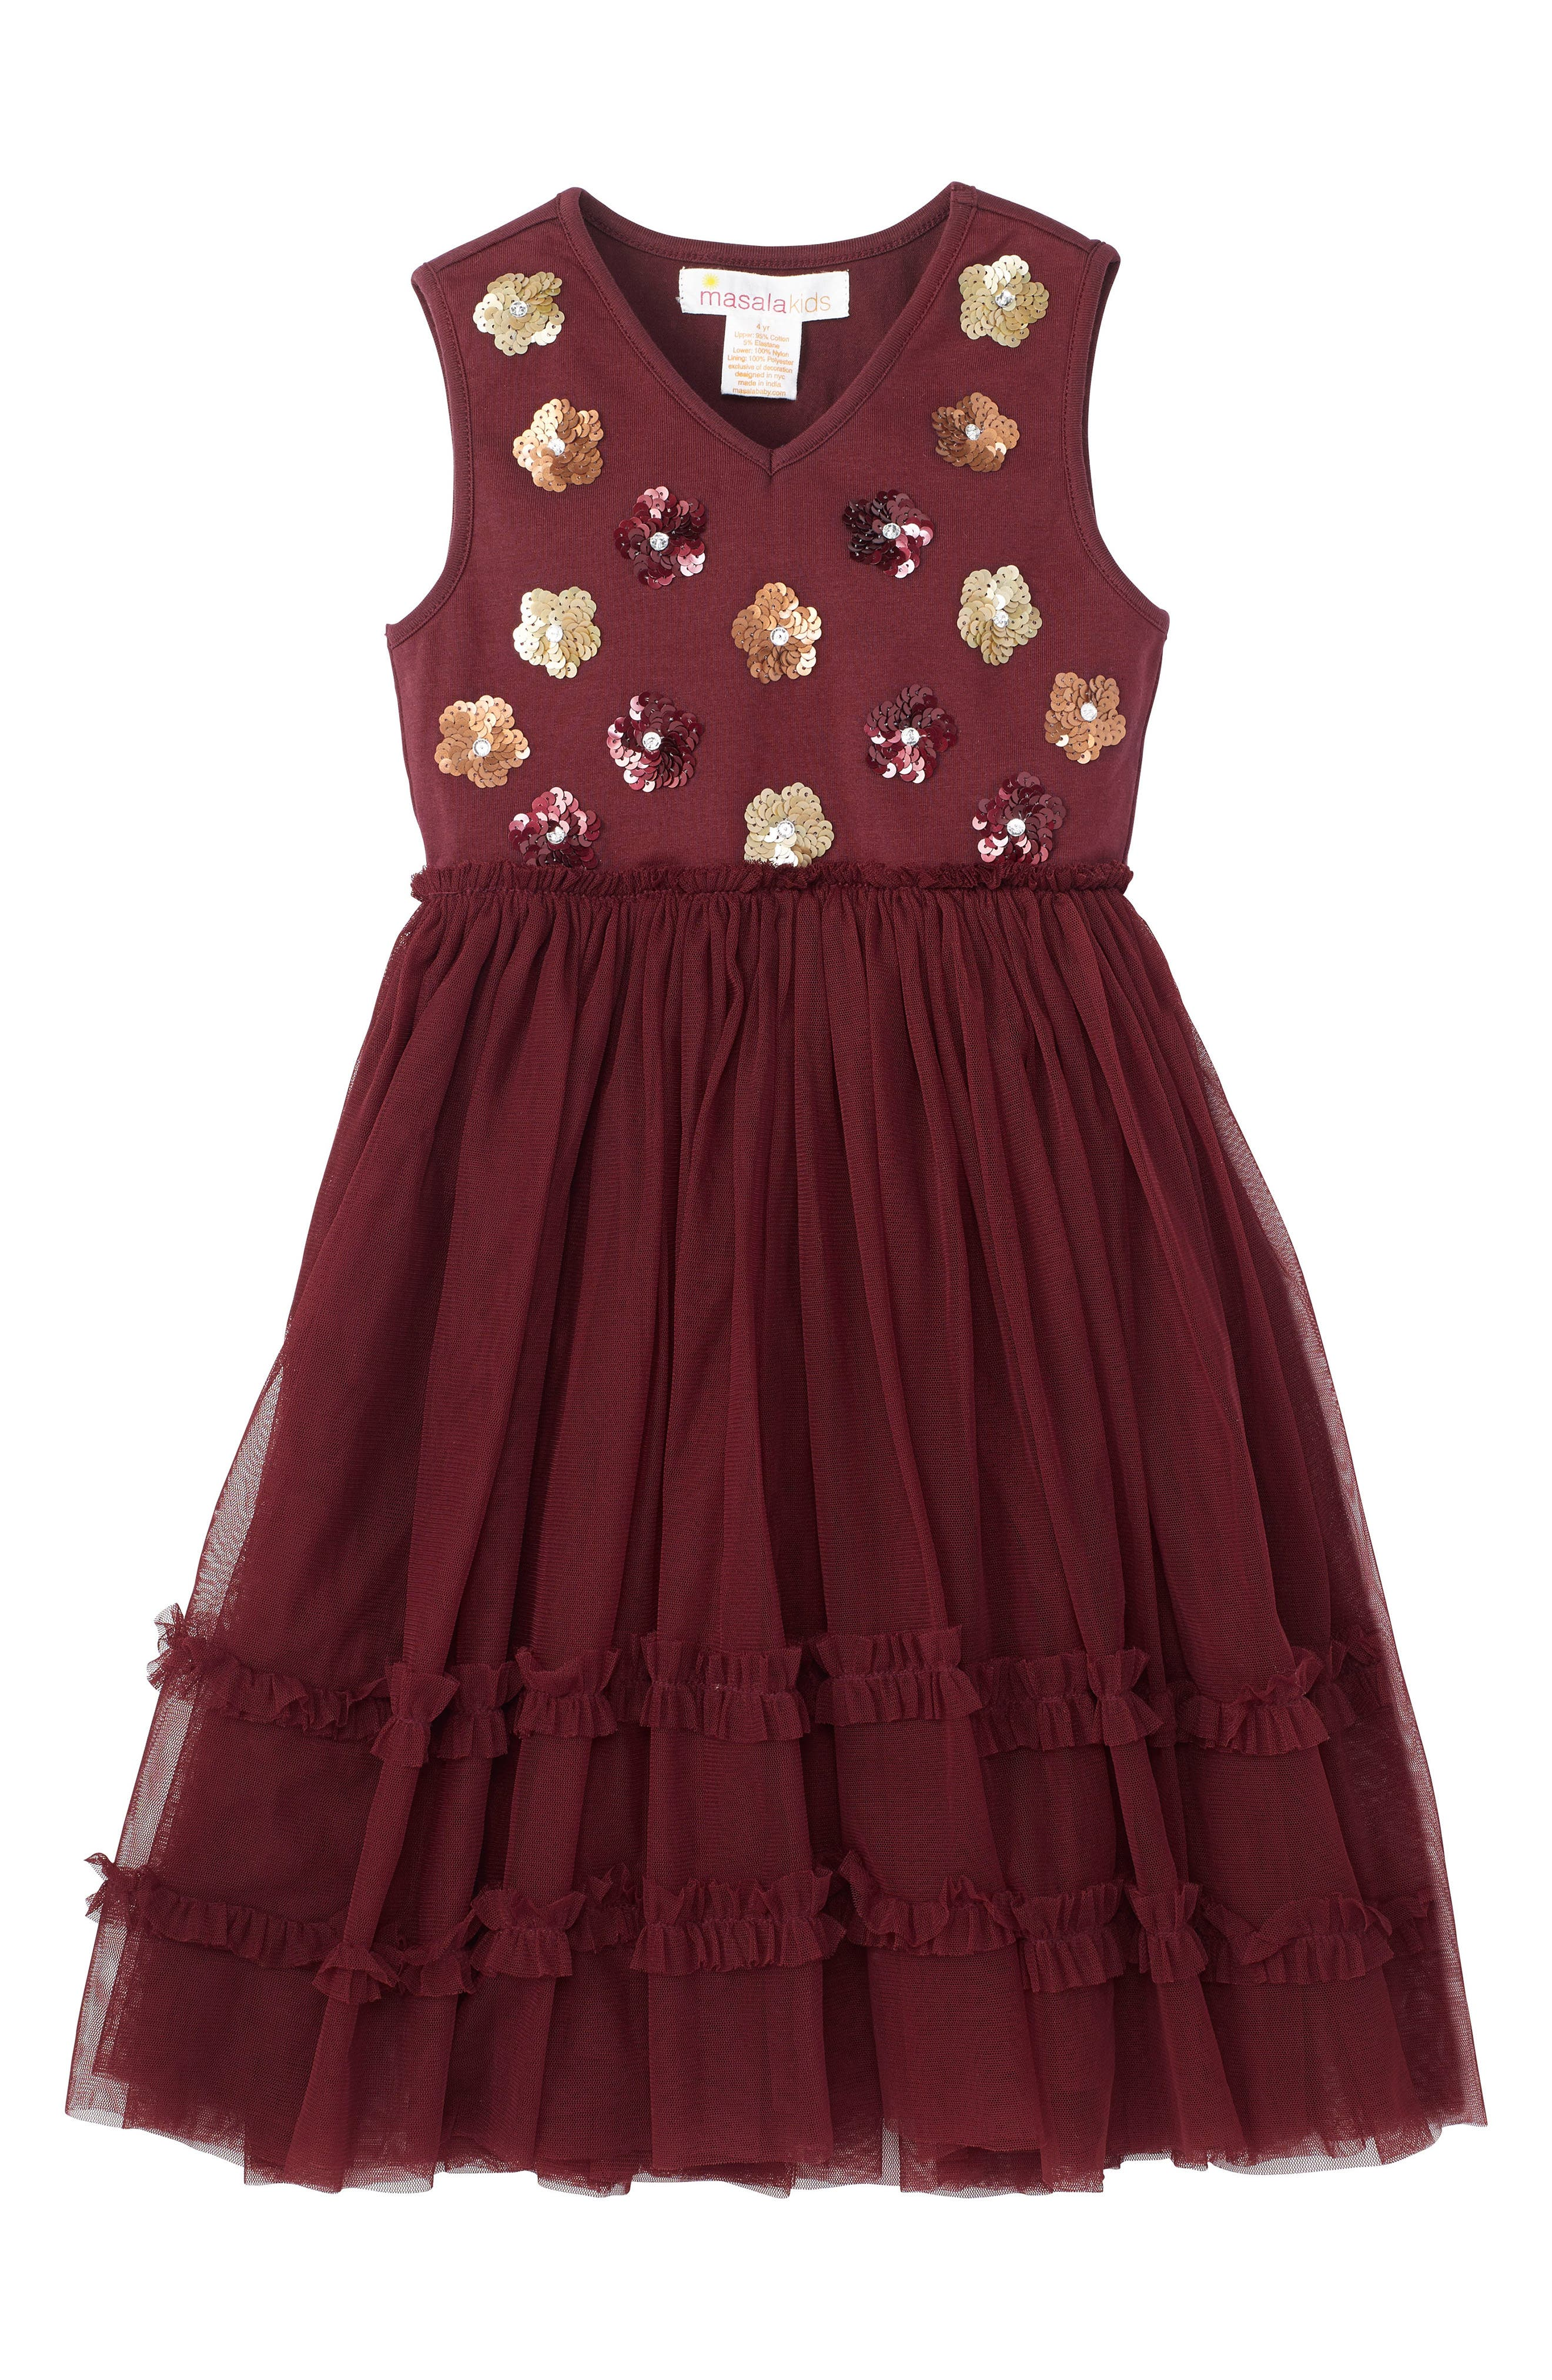 Main Image - Masalababy Liana Dress (Toddler Girls, Little Girls & Big Girls)